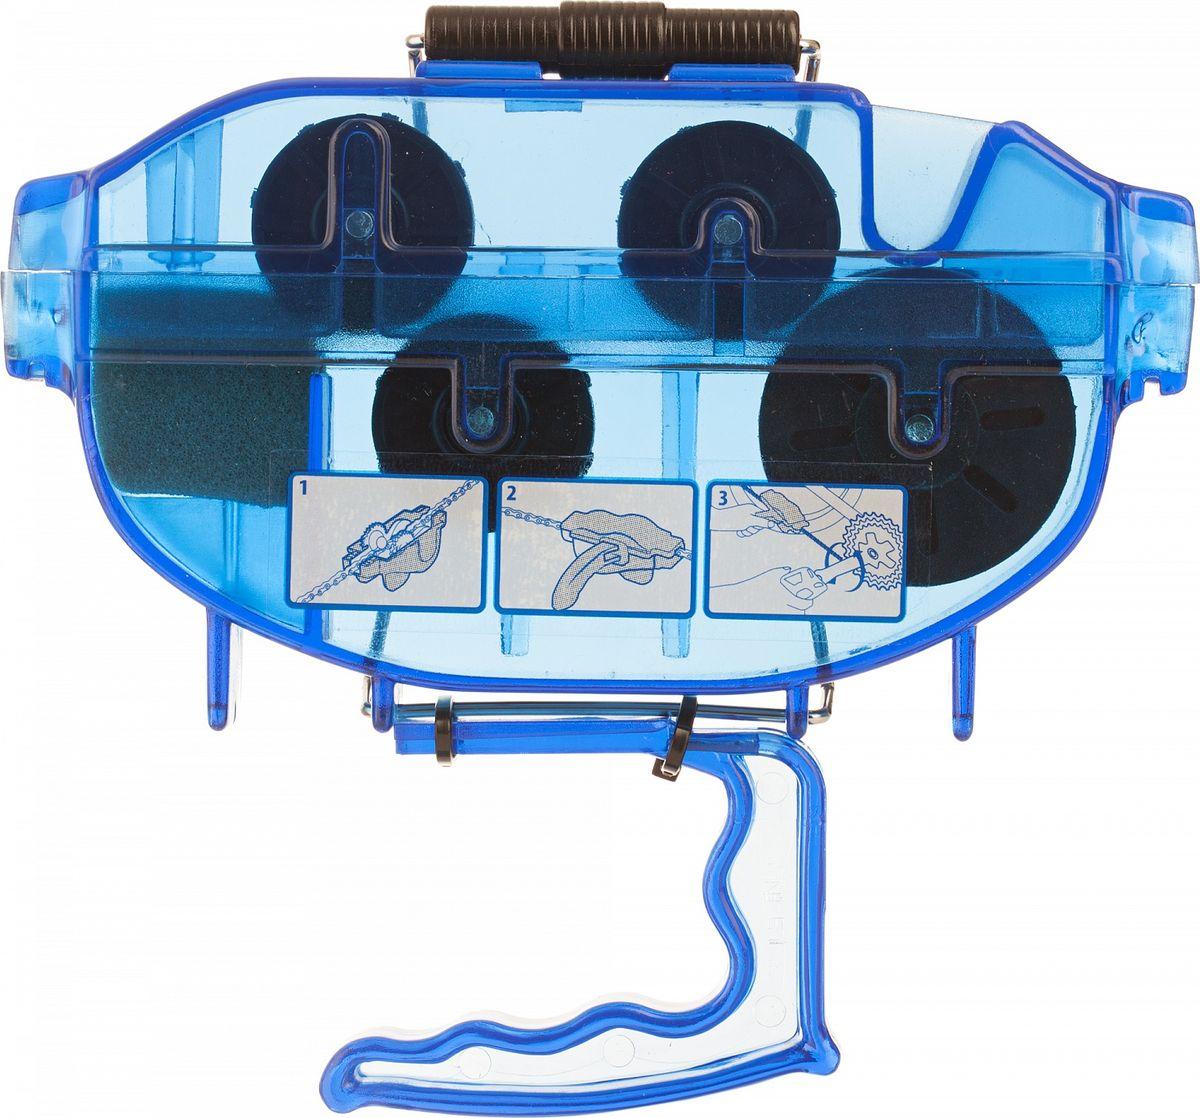 Машинка для чистки велосипедной цепи Cyclotech Chain Cleaner, цвет: синий видеорегистратор sho me fhd 625 2 45 1920x1080 3mp 170° g сенсор usb microsd microsdhc